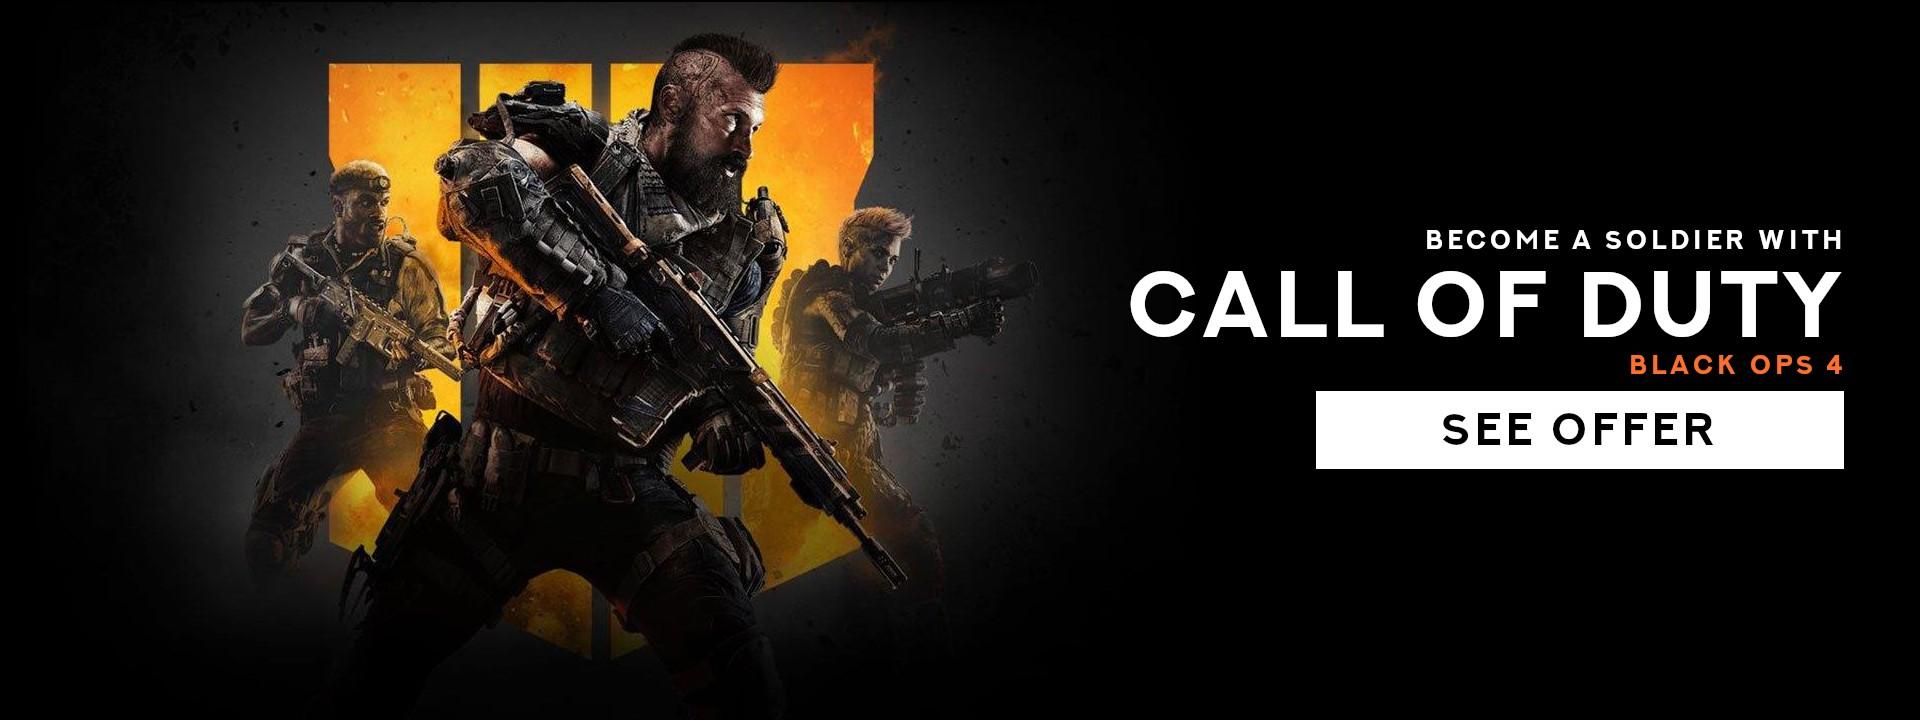 Call-of-Duty-Infinite-Warfare-PC